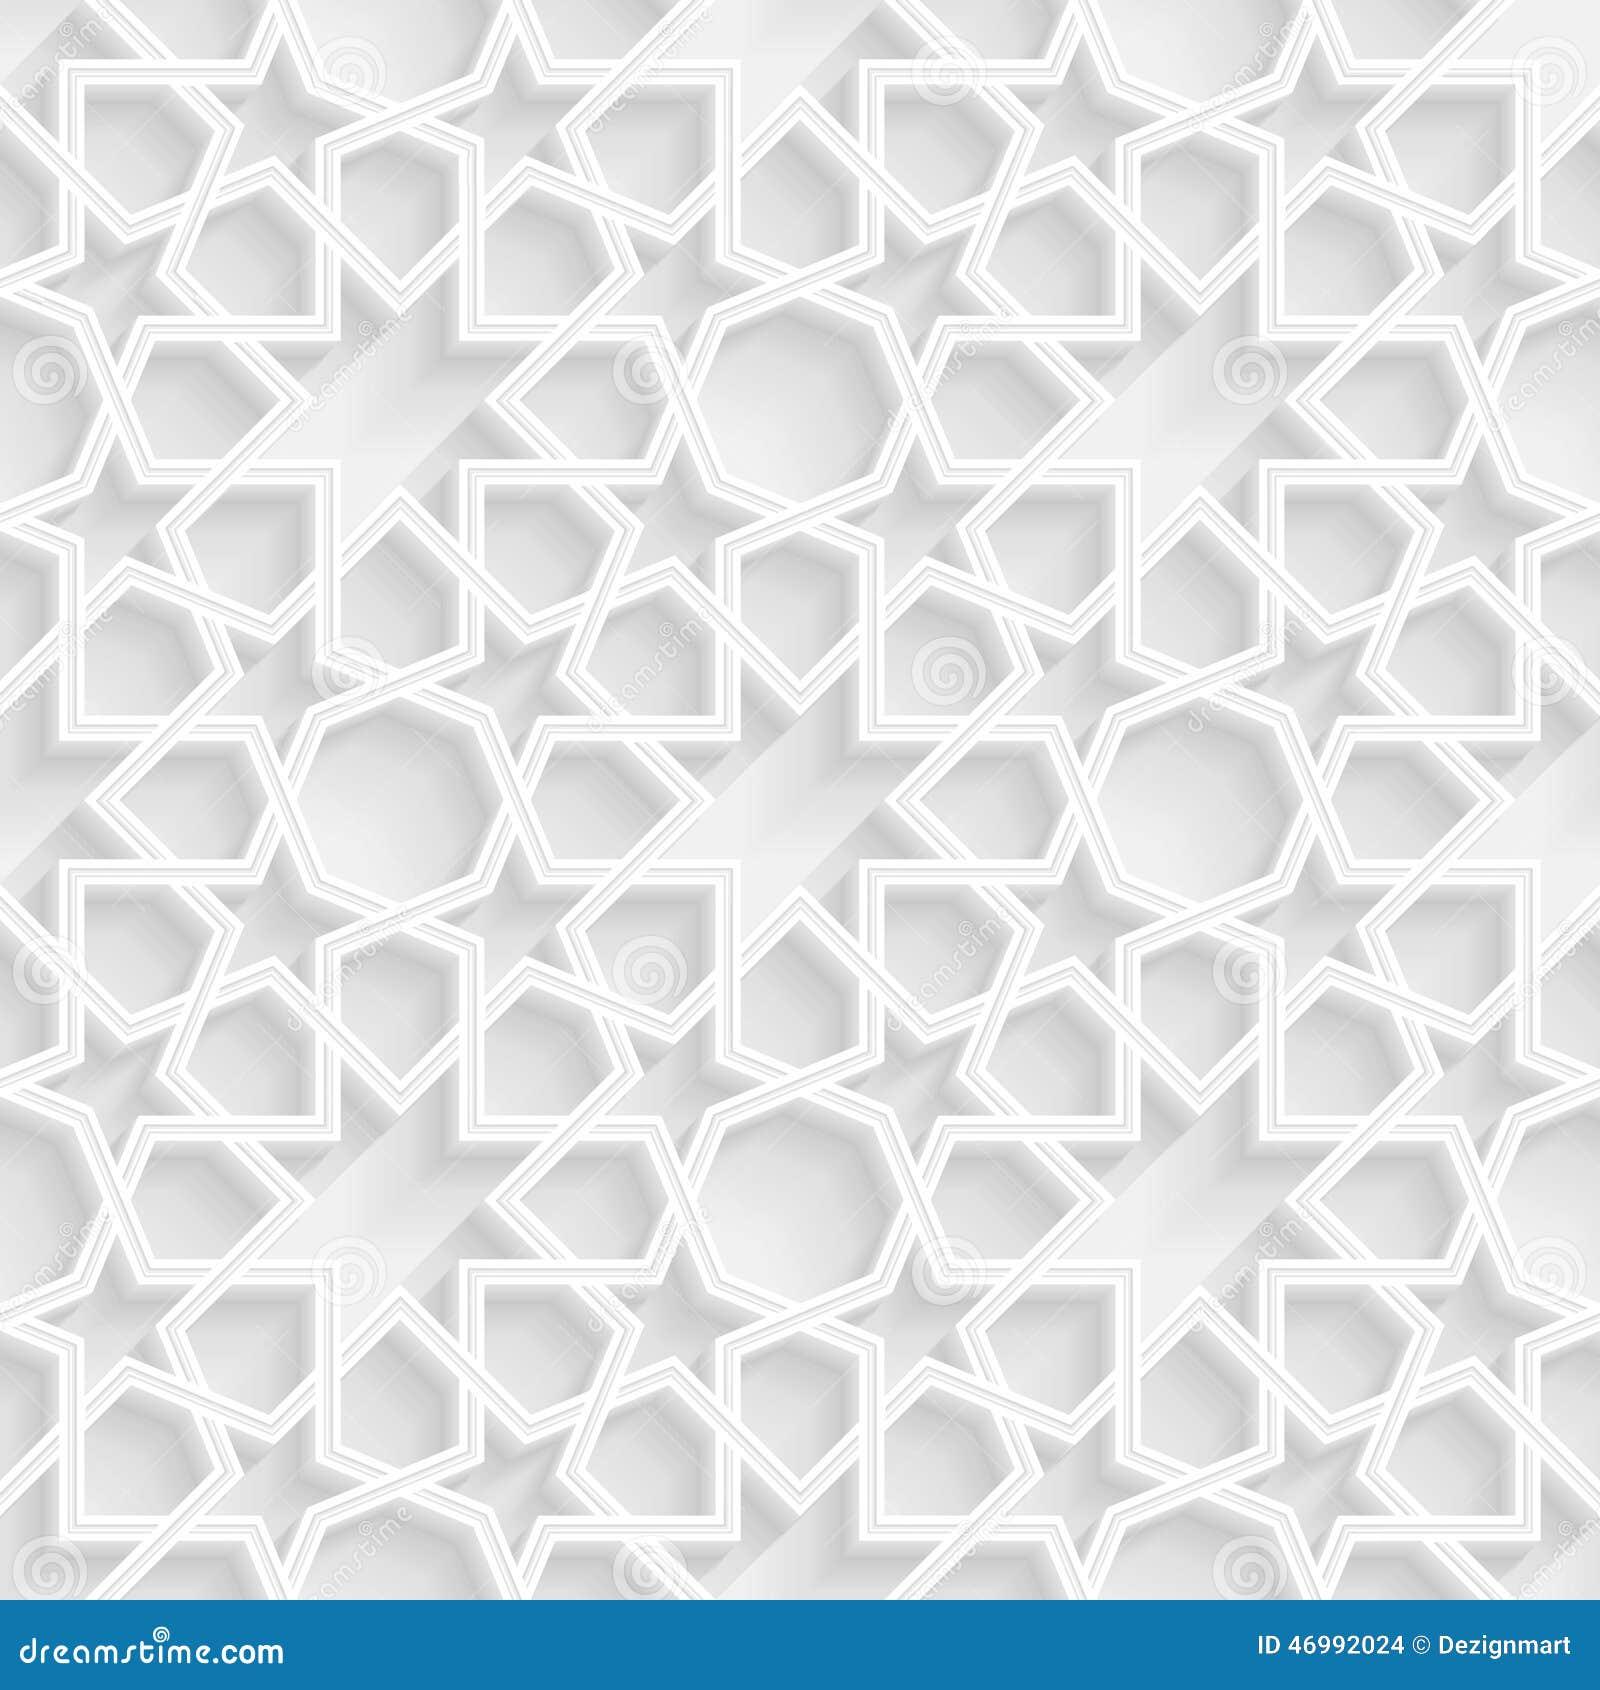 3d Geometric Star Pattern Background